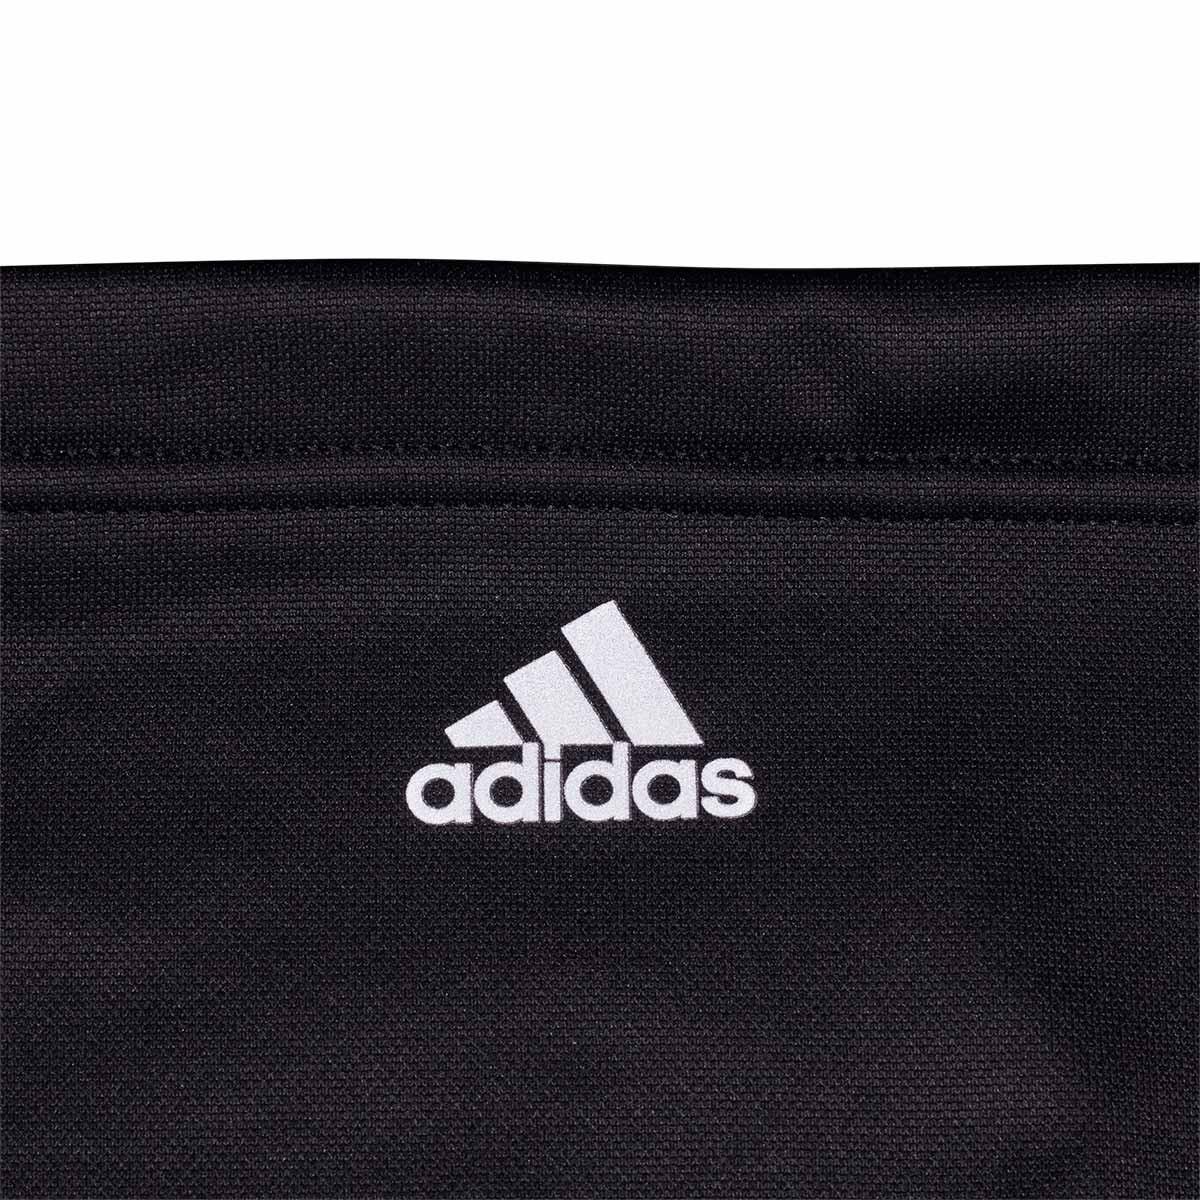 Respetuoso del medio ambiente Gallo Circo  Neck Warmer adidas Climawarm Black-White - Football store Fútbol Emotion